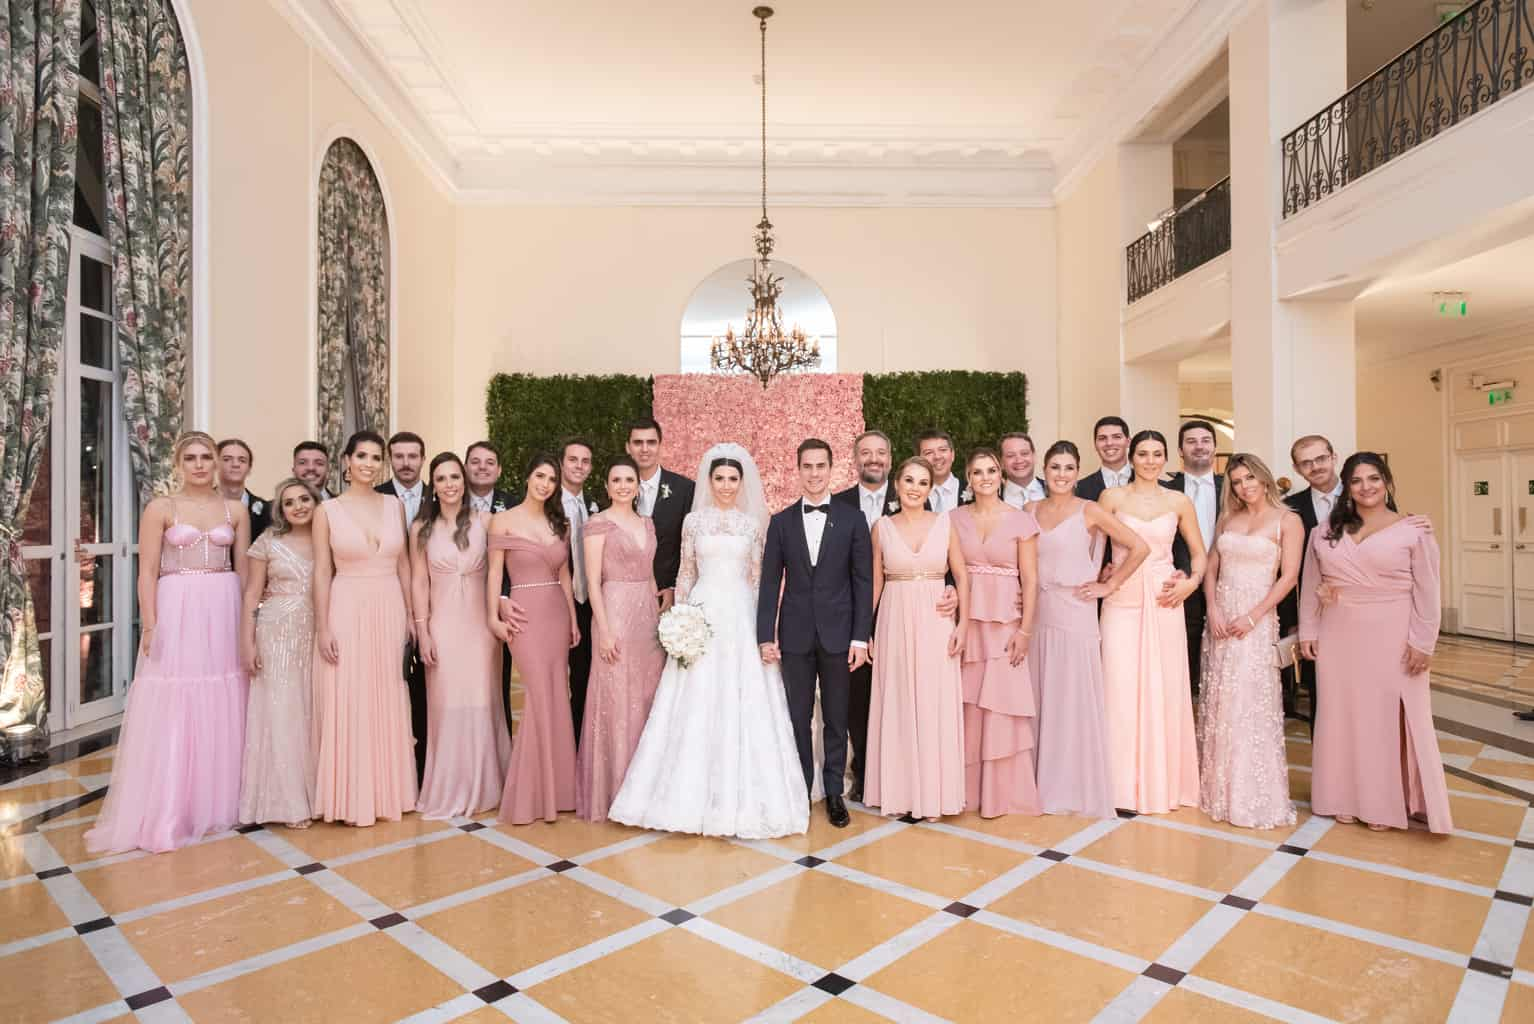 casamento-Patricia-e-Thiago-Copacabana-Palace-Marcelo-Hicho-Paula-Rocha-Marina-Fava-1304-Patricia-e-Thiago-MFF_1232